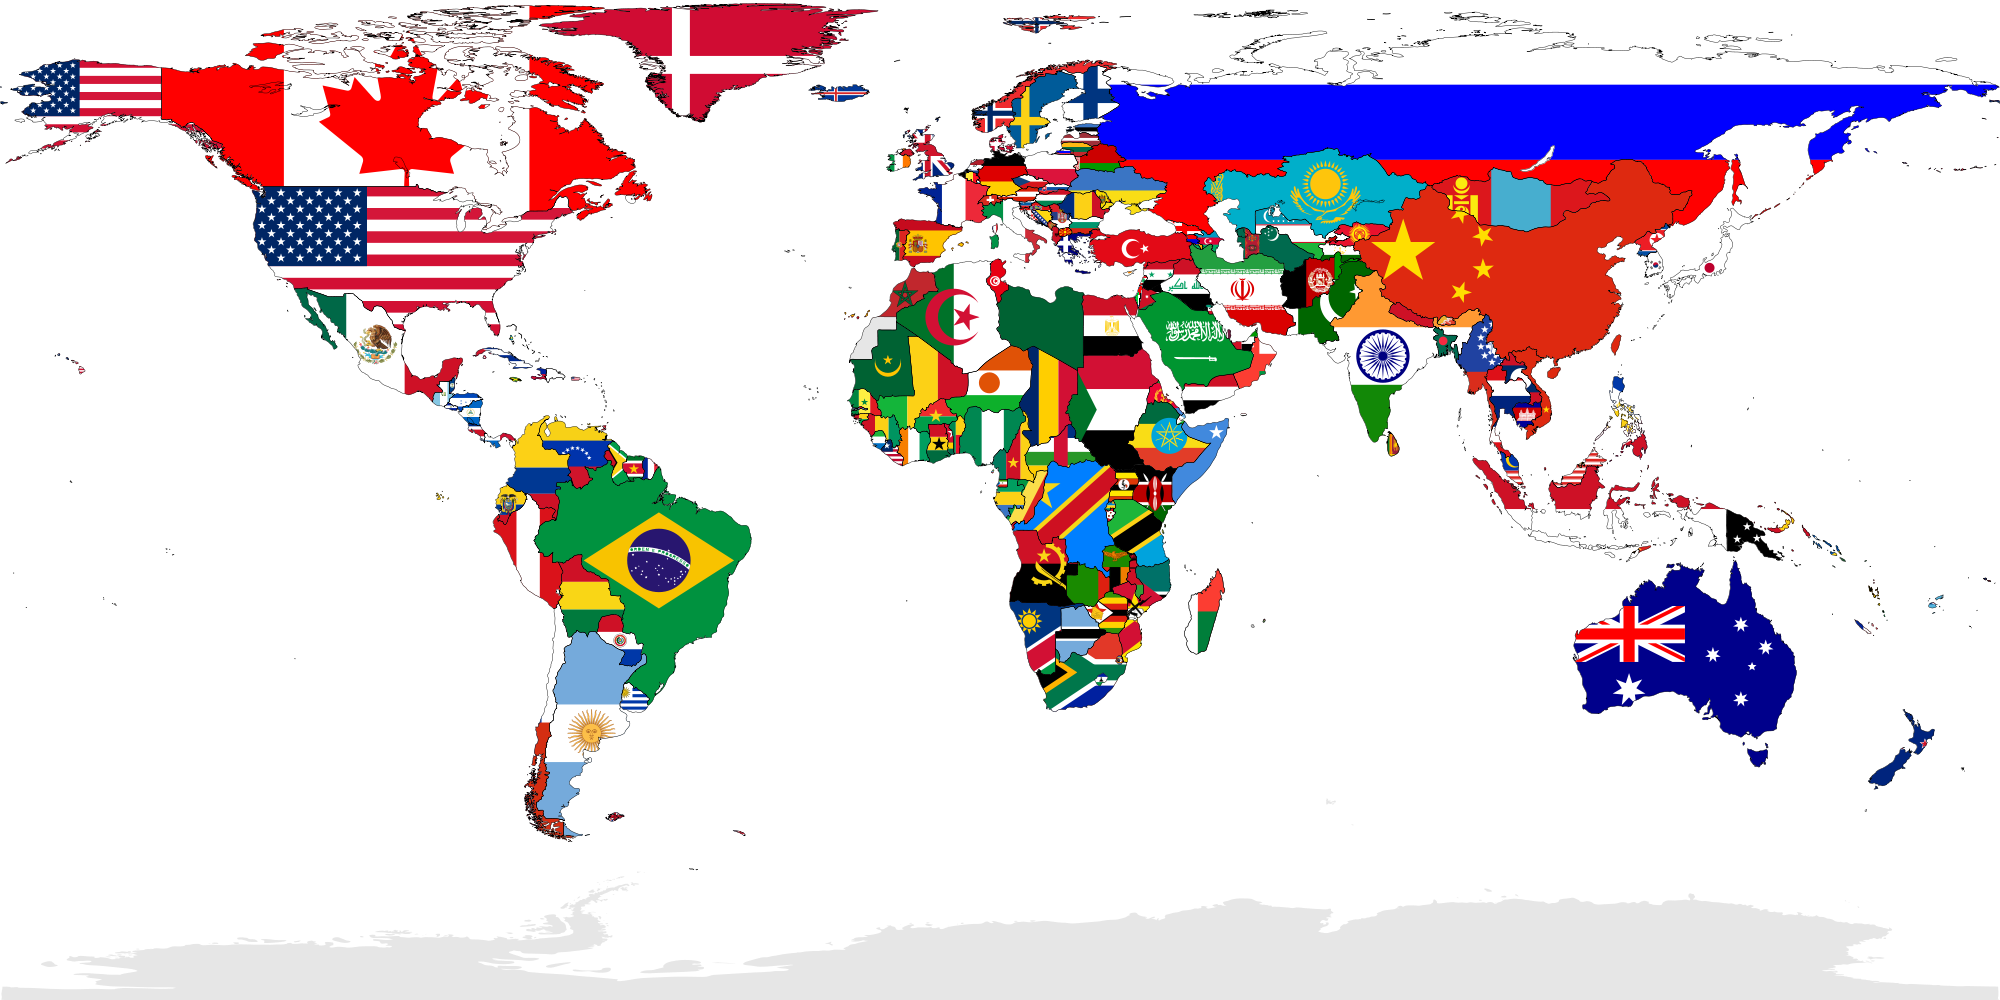 Blindbandit92 & Blazeandarose Images World Map Hd Wallpaper - World Map Country Flag , HD Wallpaper & Backgrounds